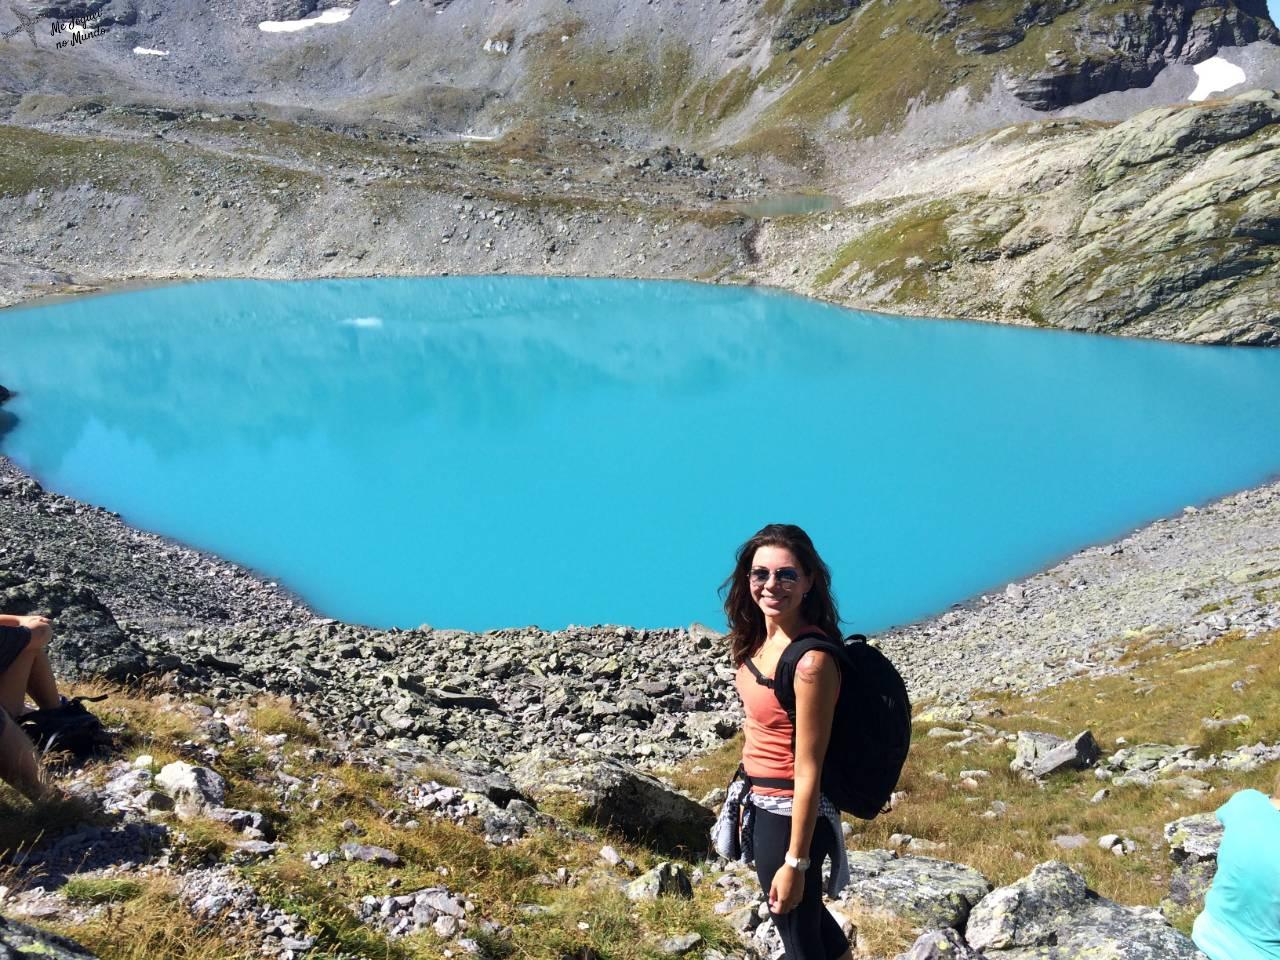 lago wildsee em pizol suiça